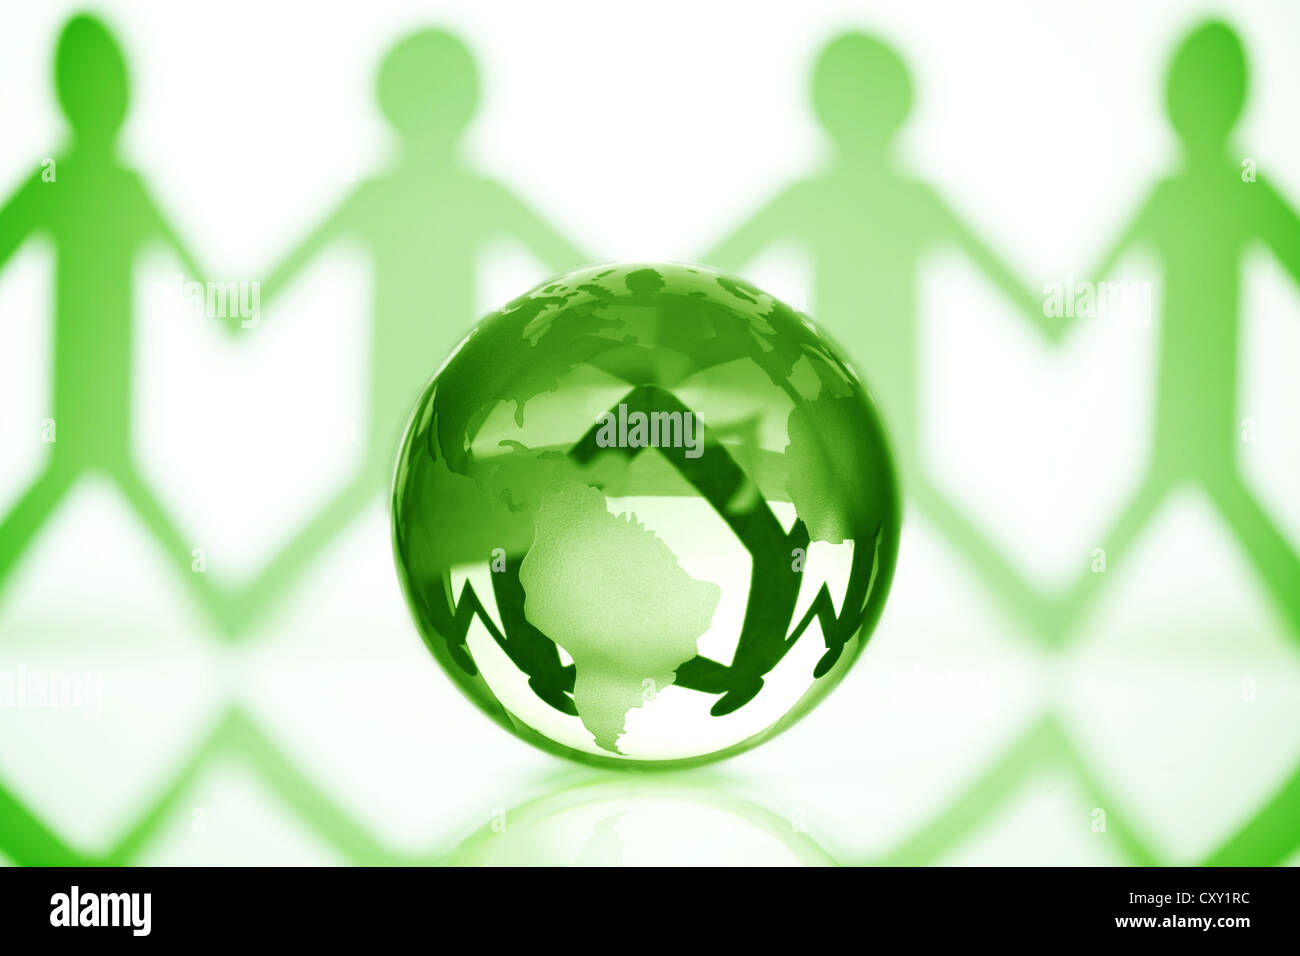 Global community - Stock Image